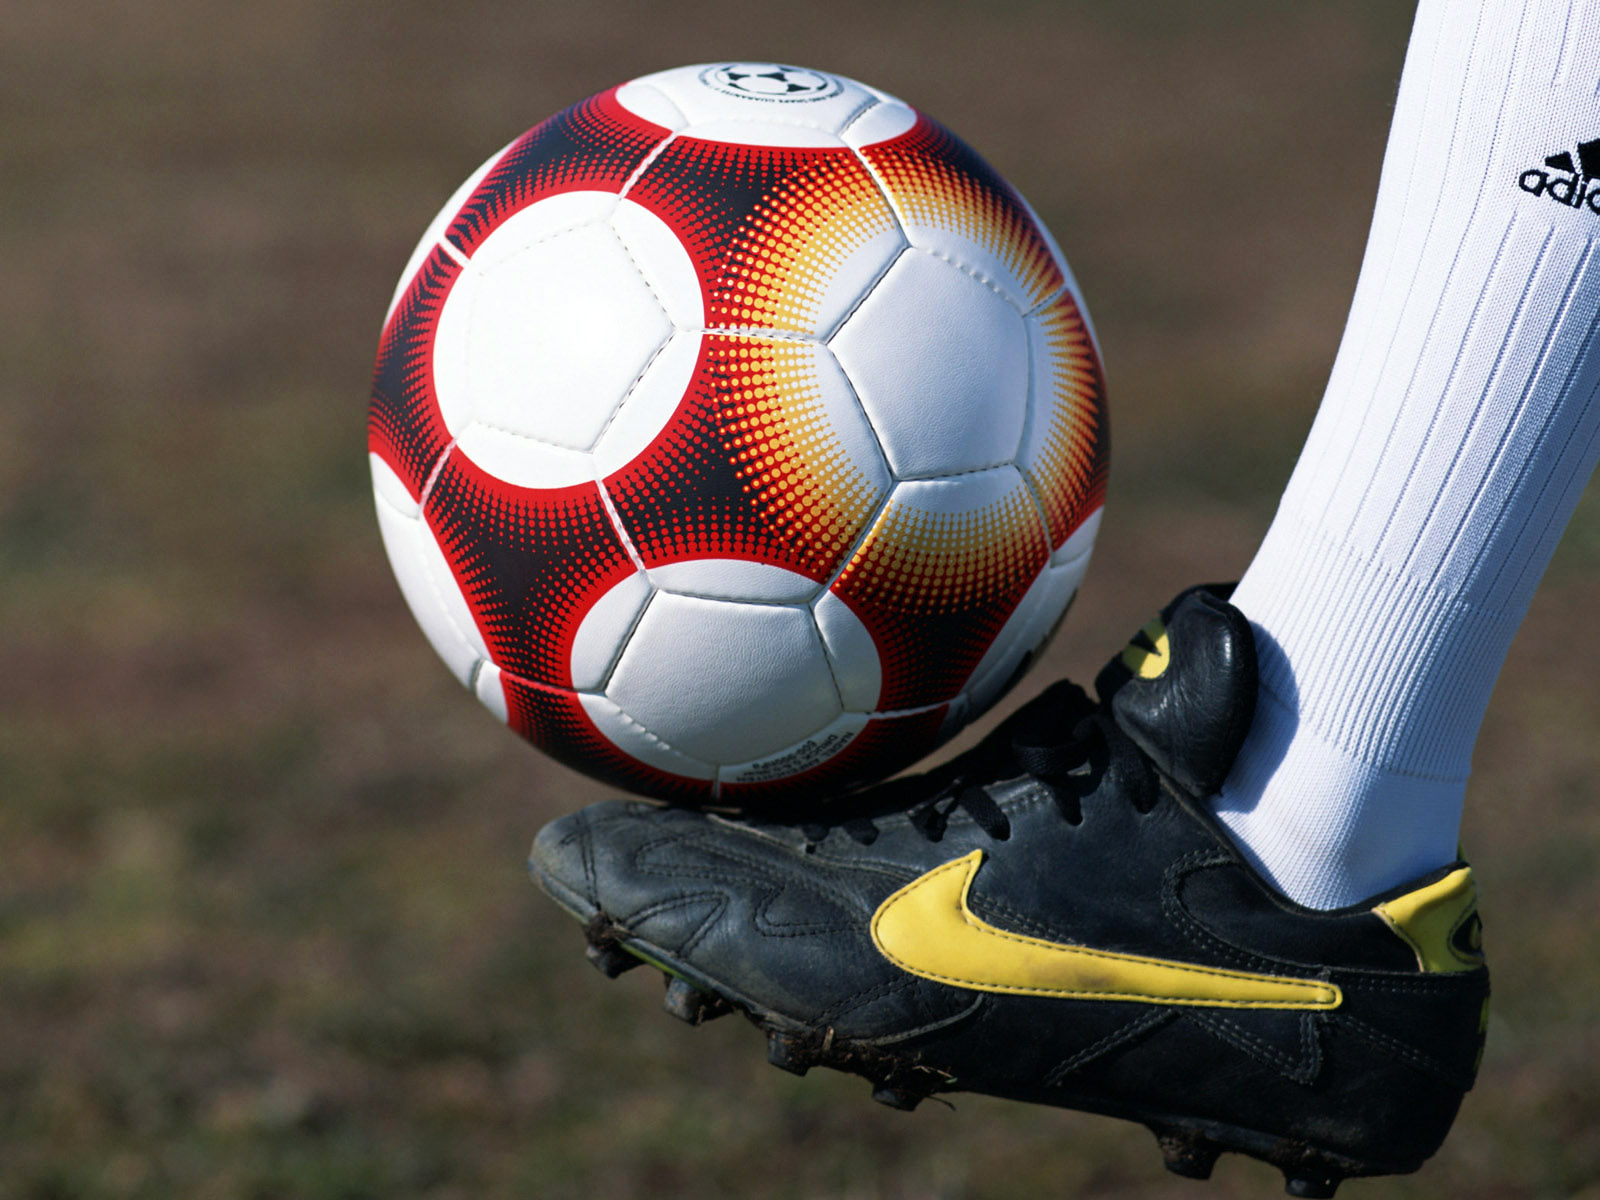 Football Wallpapers Desktop Background: Stock Free Images: September 2011